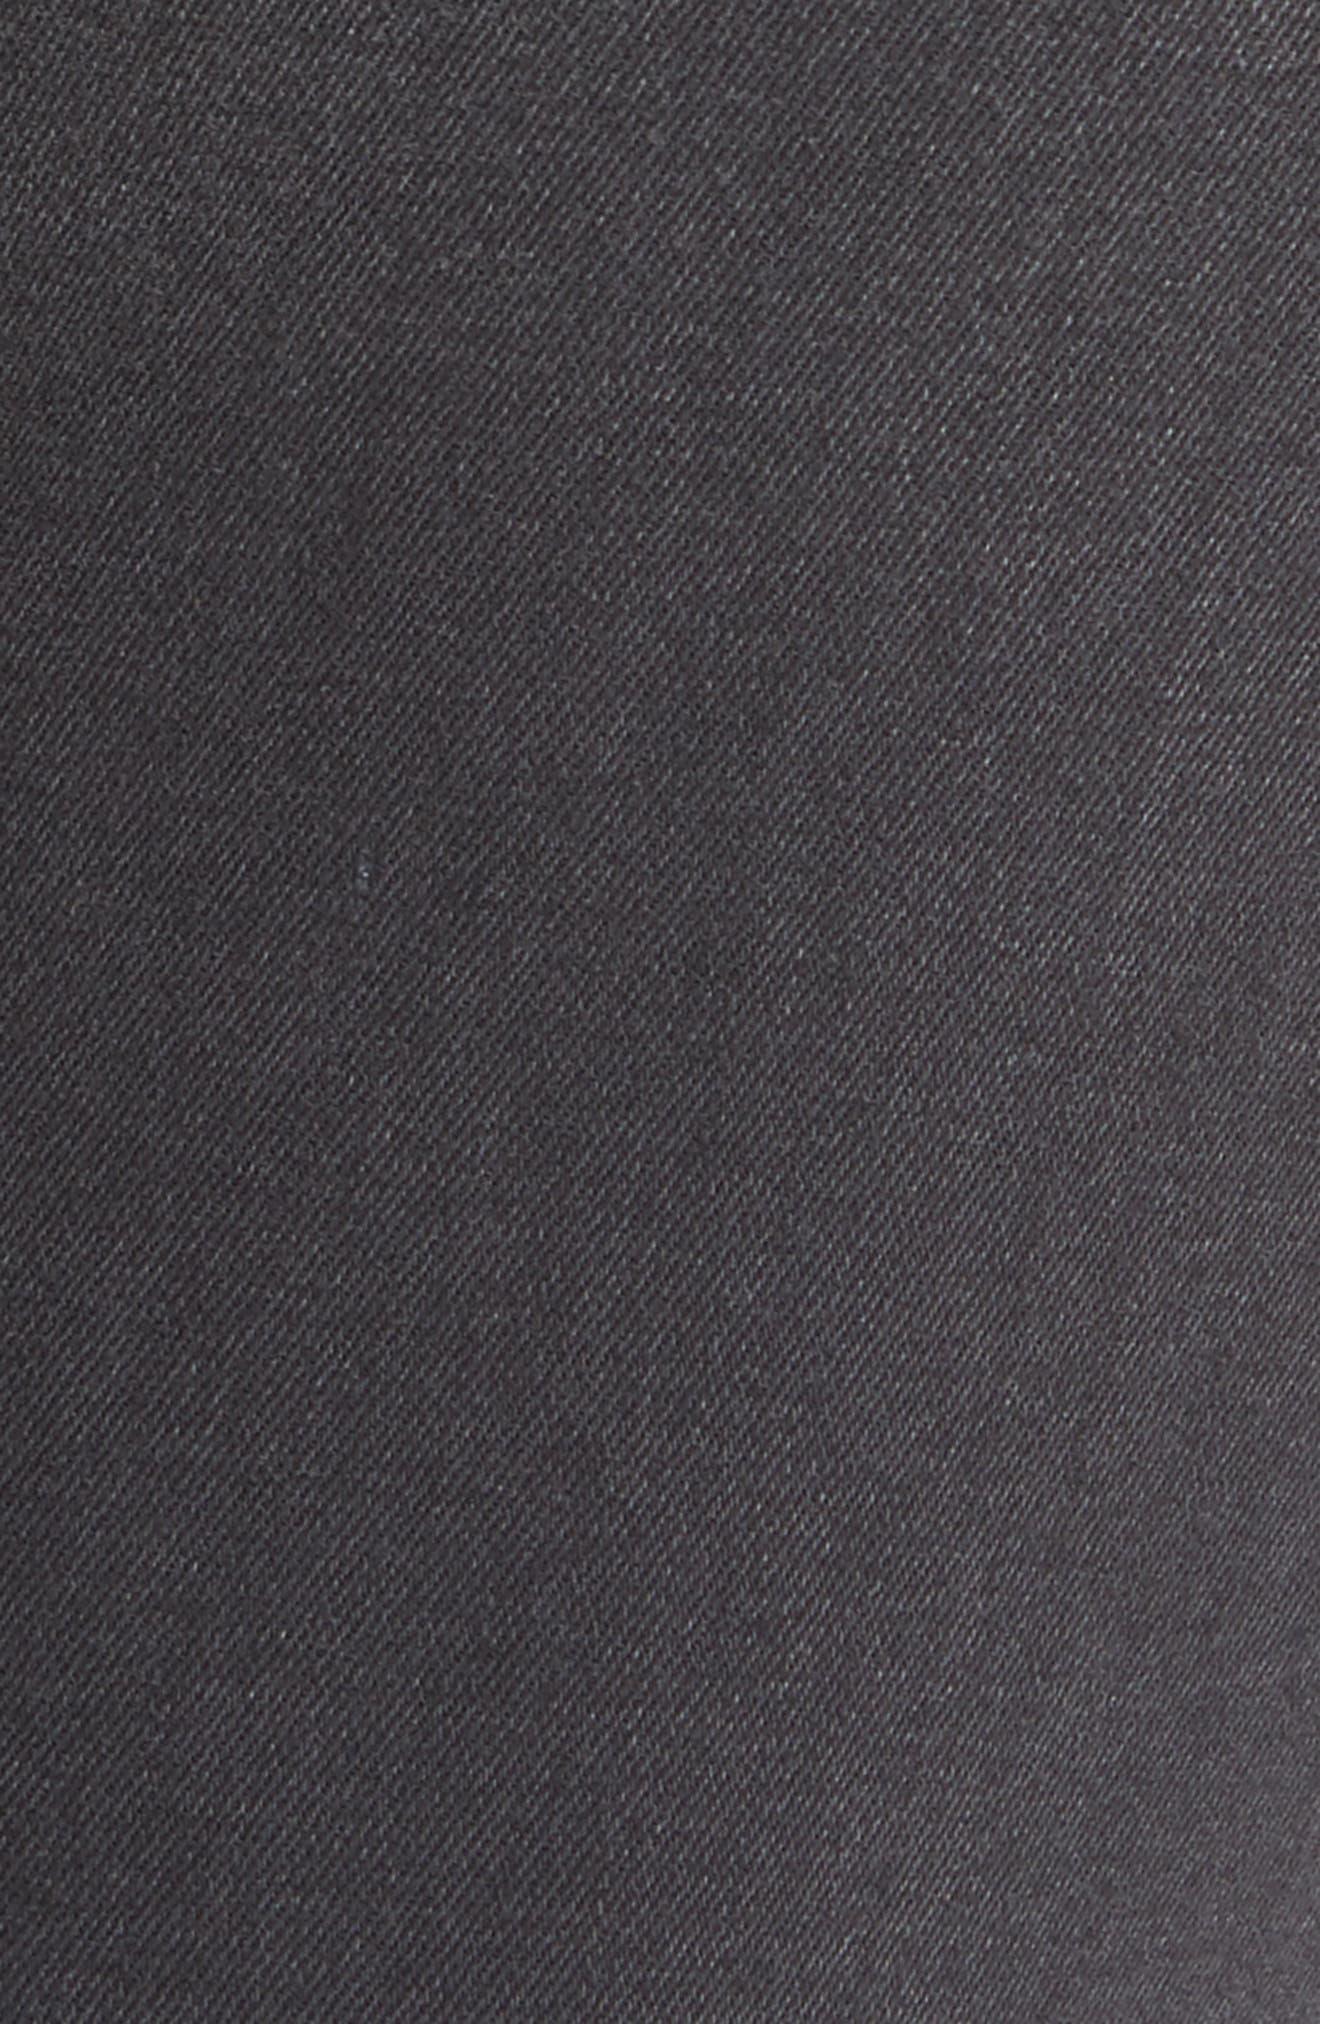 Two Tone Stretch Girlfriend Jeans,                             Alternate thumbnail 5, color,                             Cassiar